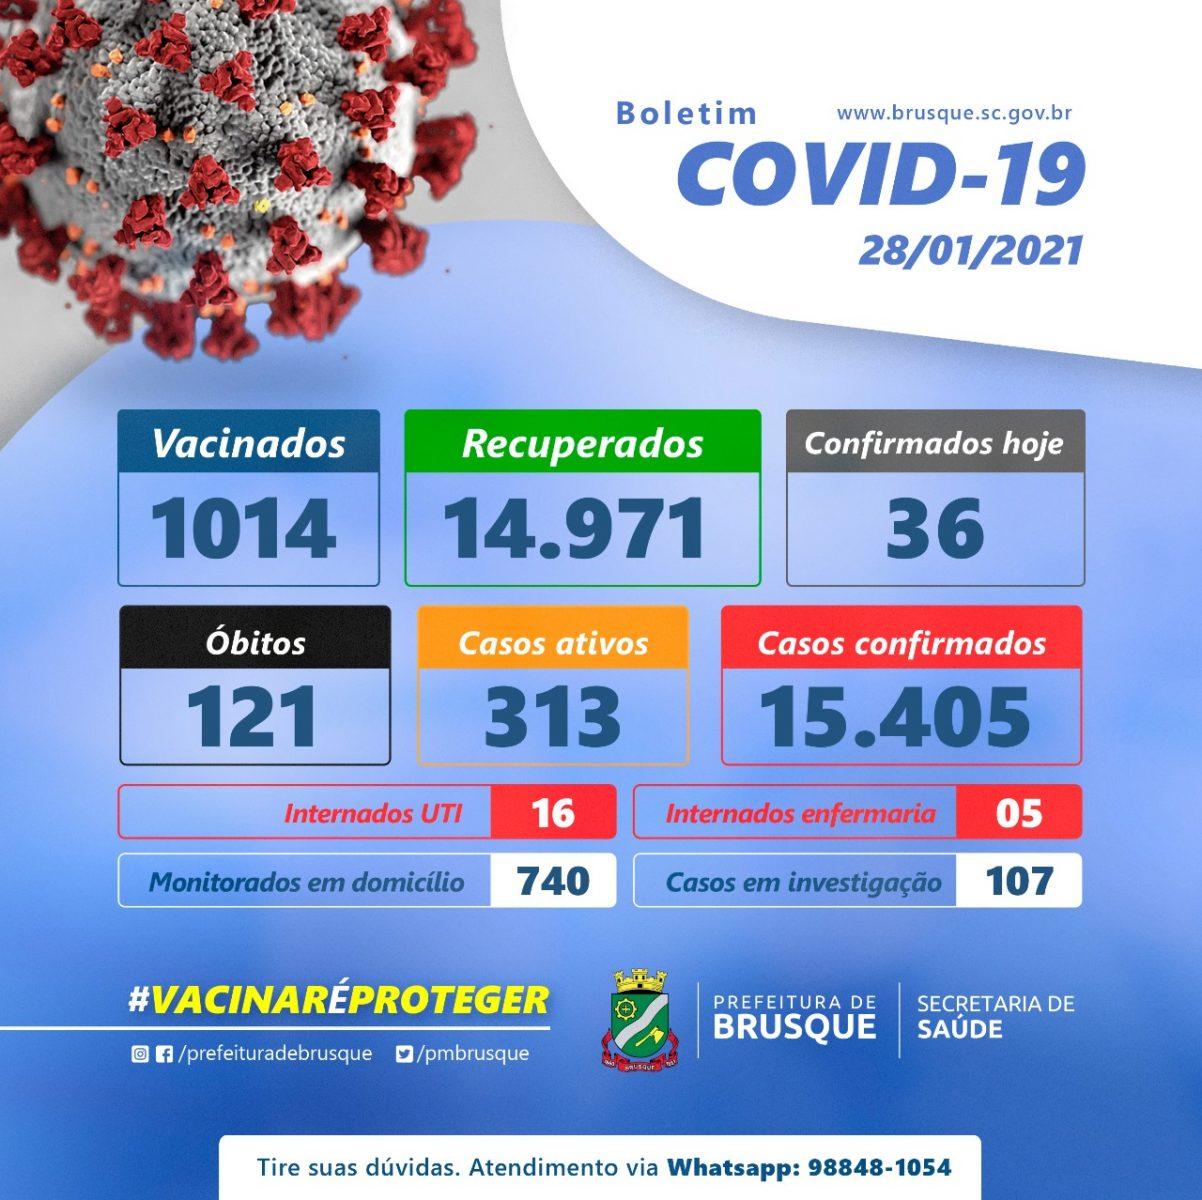 Covid-19: Confira o boletim epidemiológico desta quinta-feira (28)